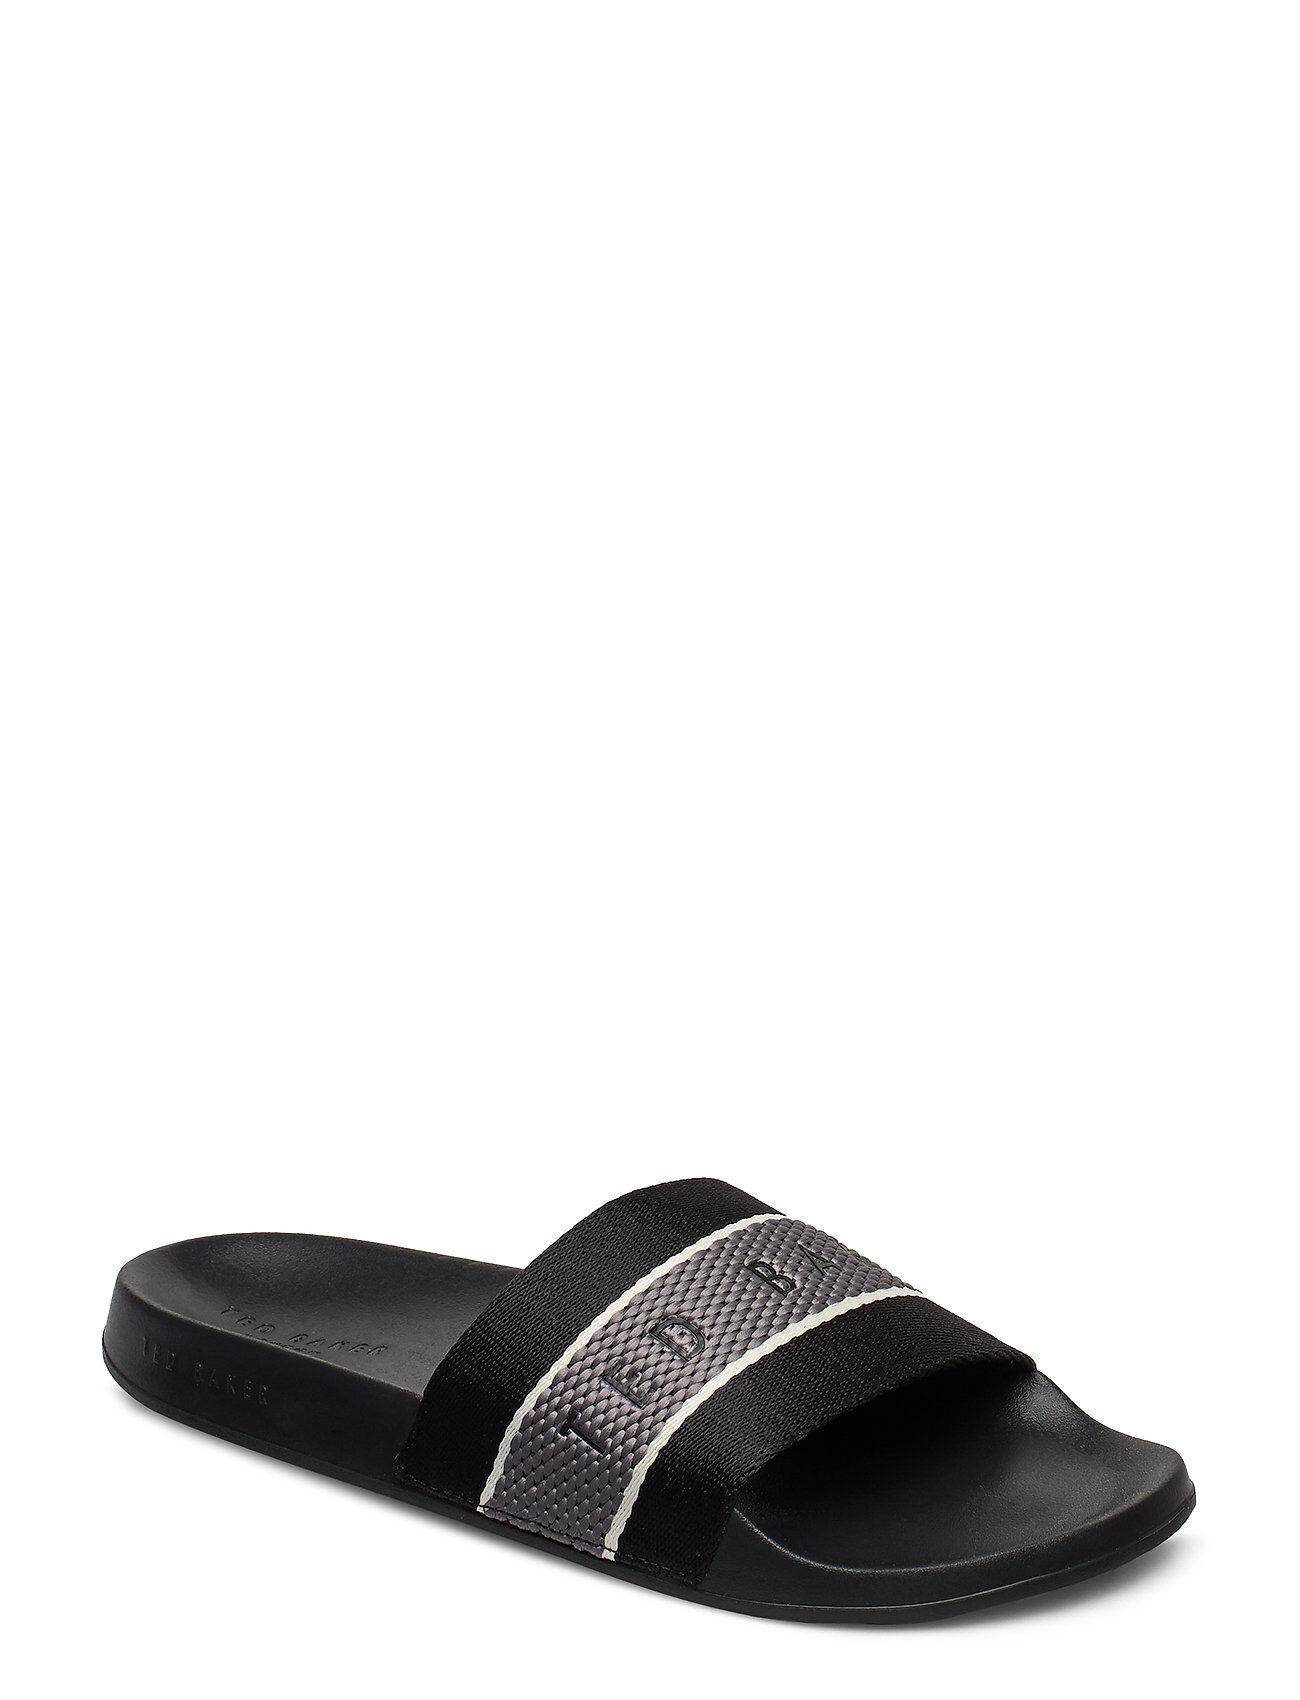 Ted Baker Rastar Shoes Summer Shoes Pool Sliders Musta Ted Baker